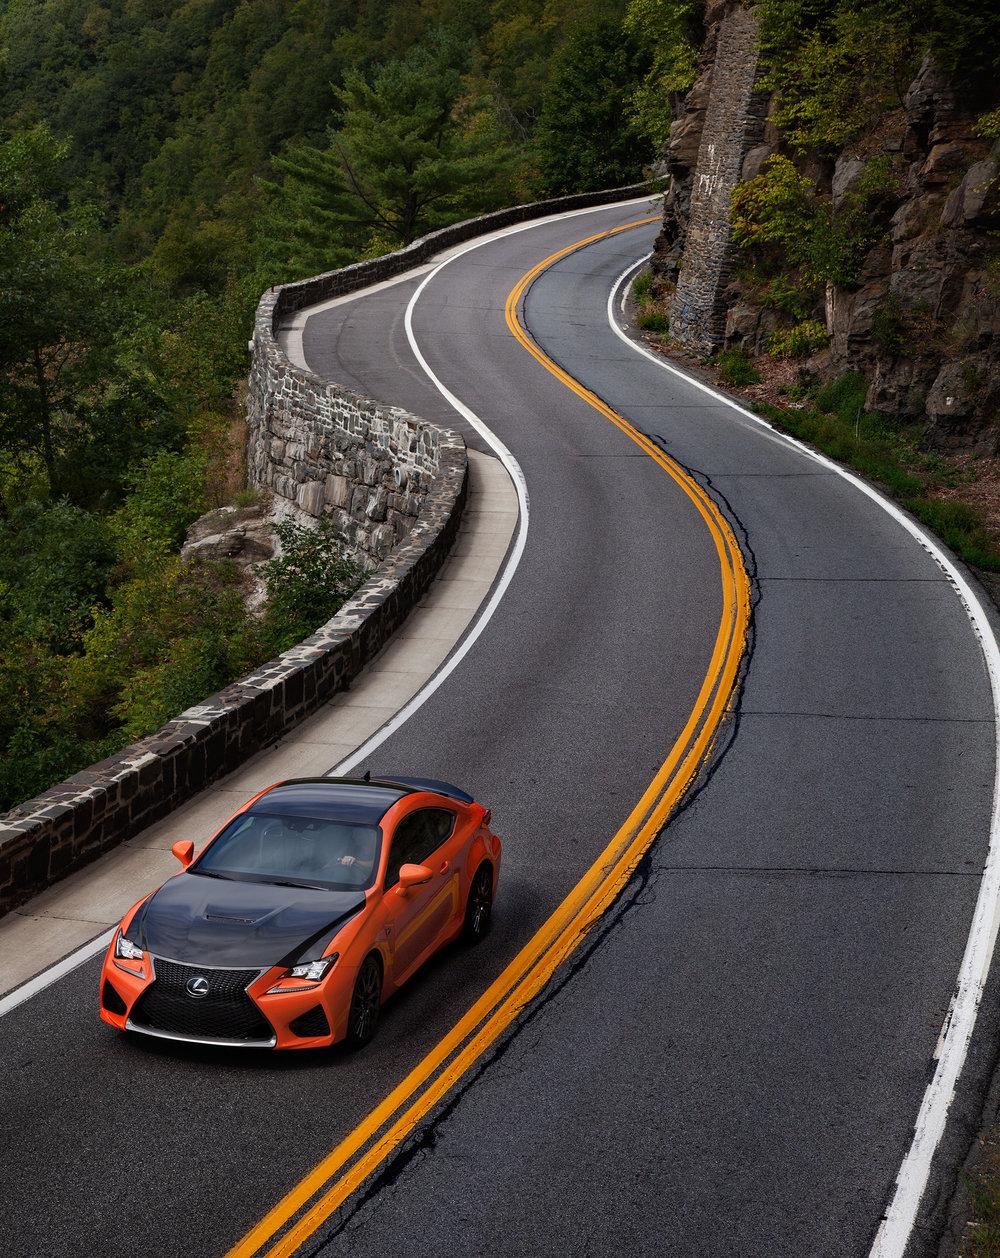 06_Lexus_Landscape_142.jpg